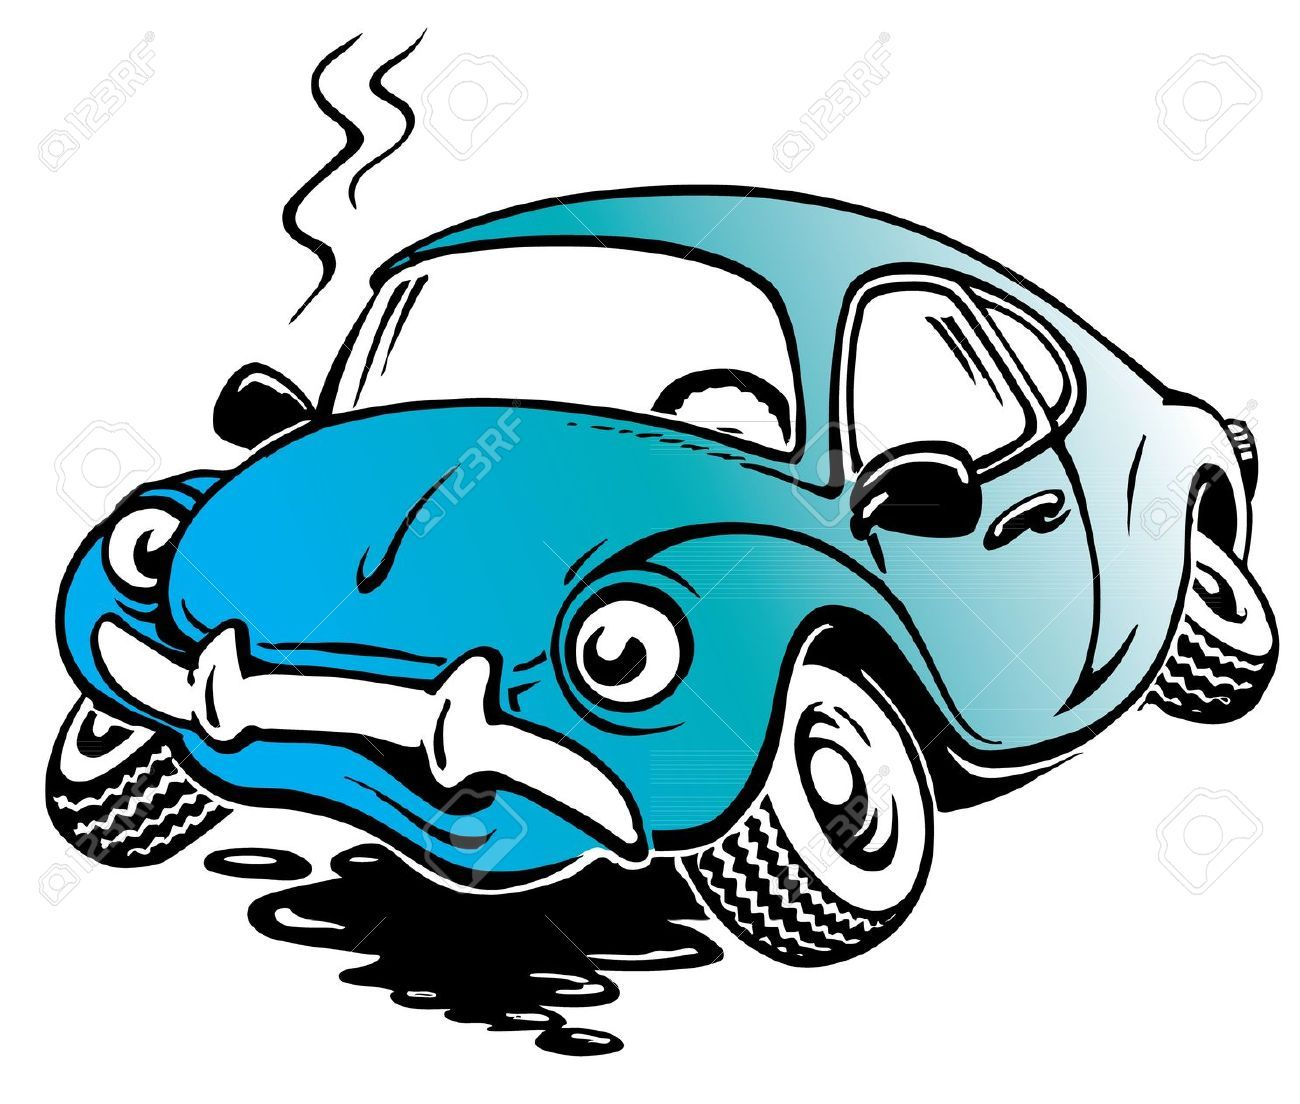 Pin By Tonia On Crash Cartoon Clip Art Car Cartoon Cartoon Pics